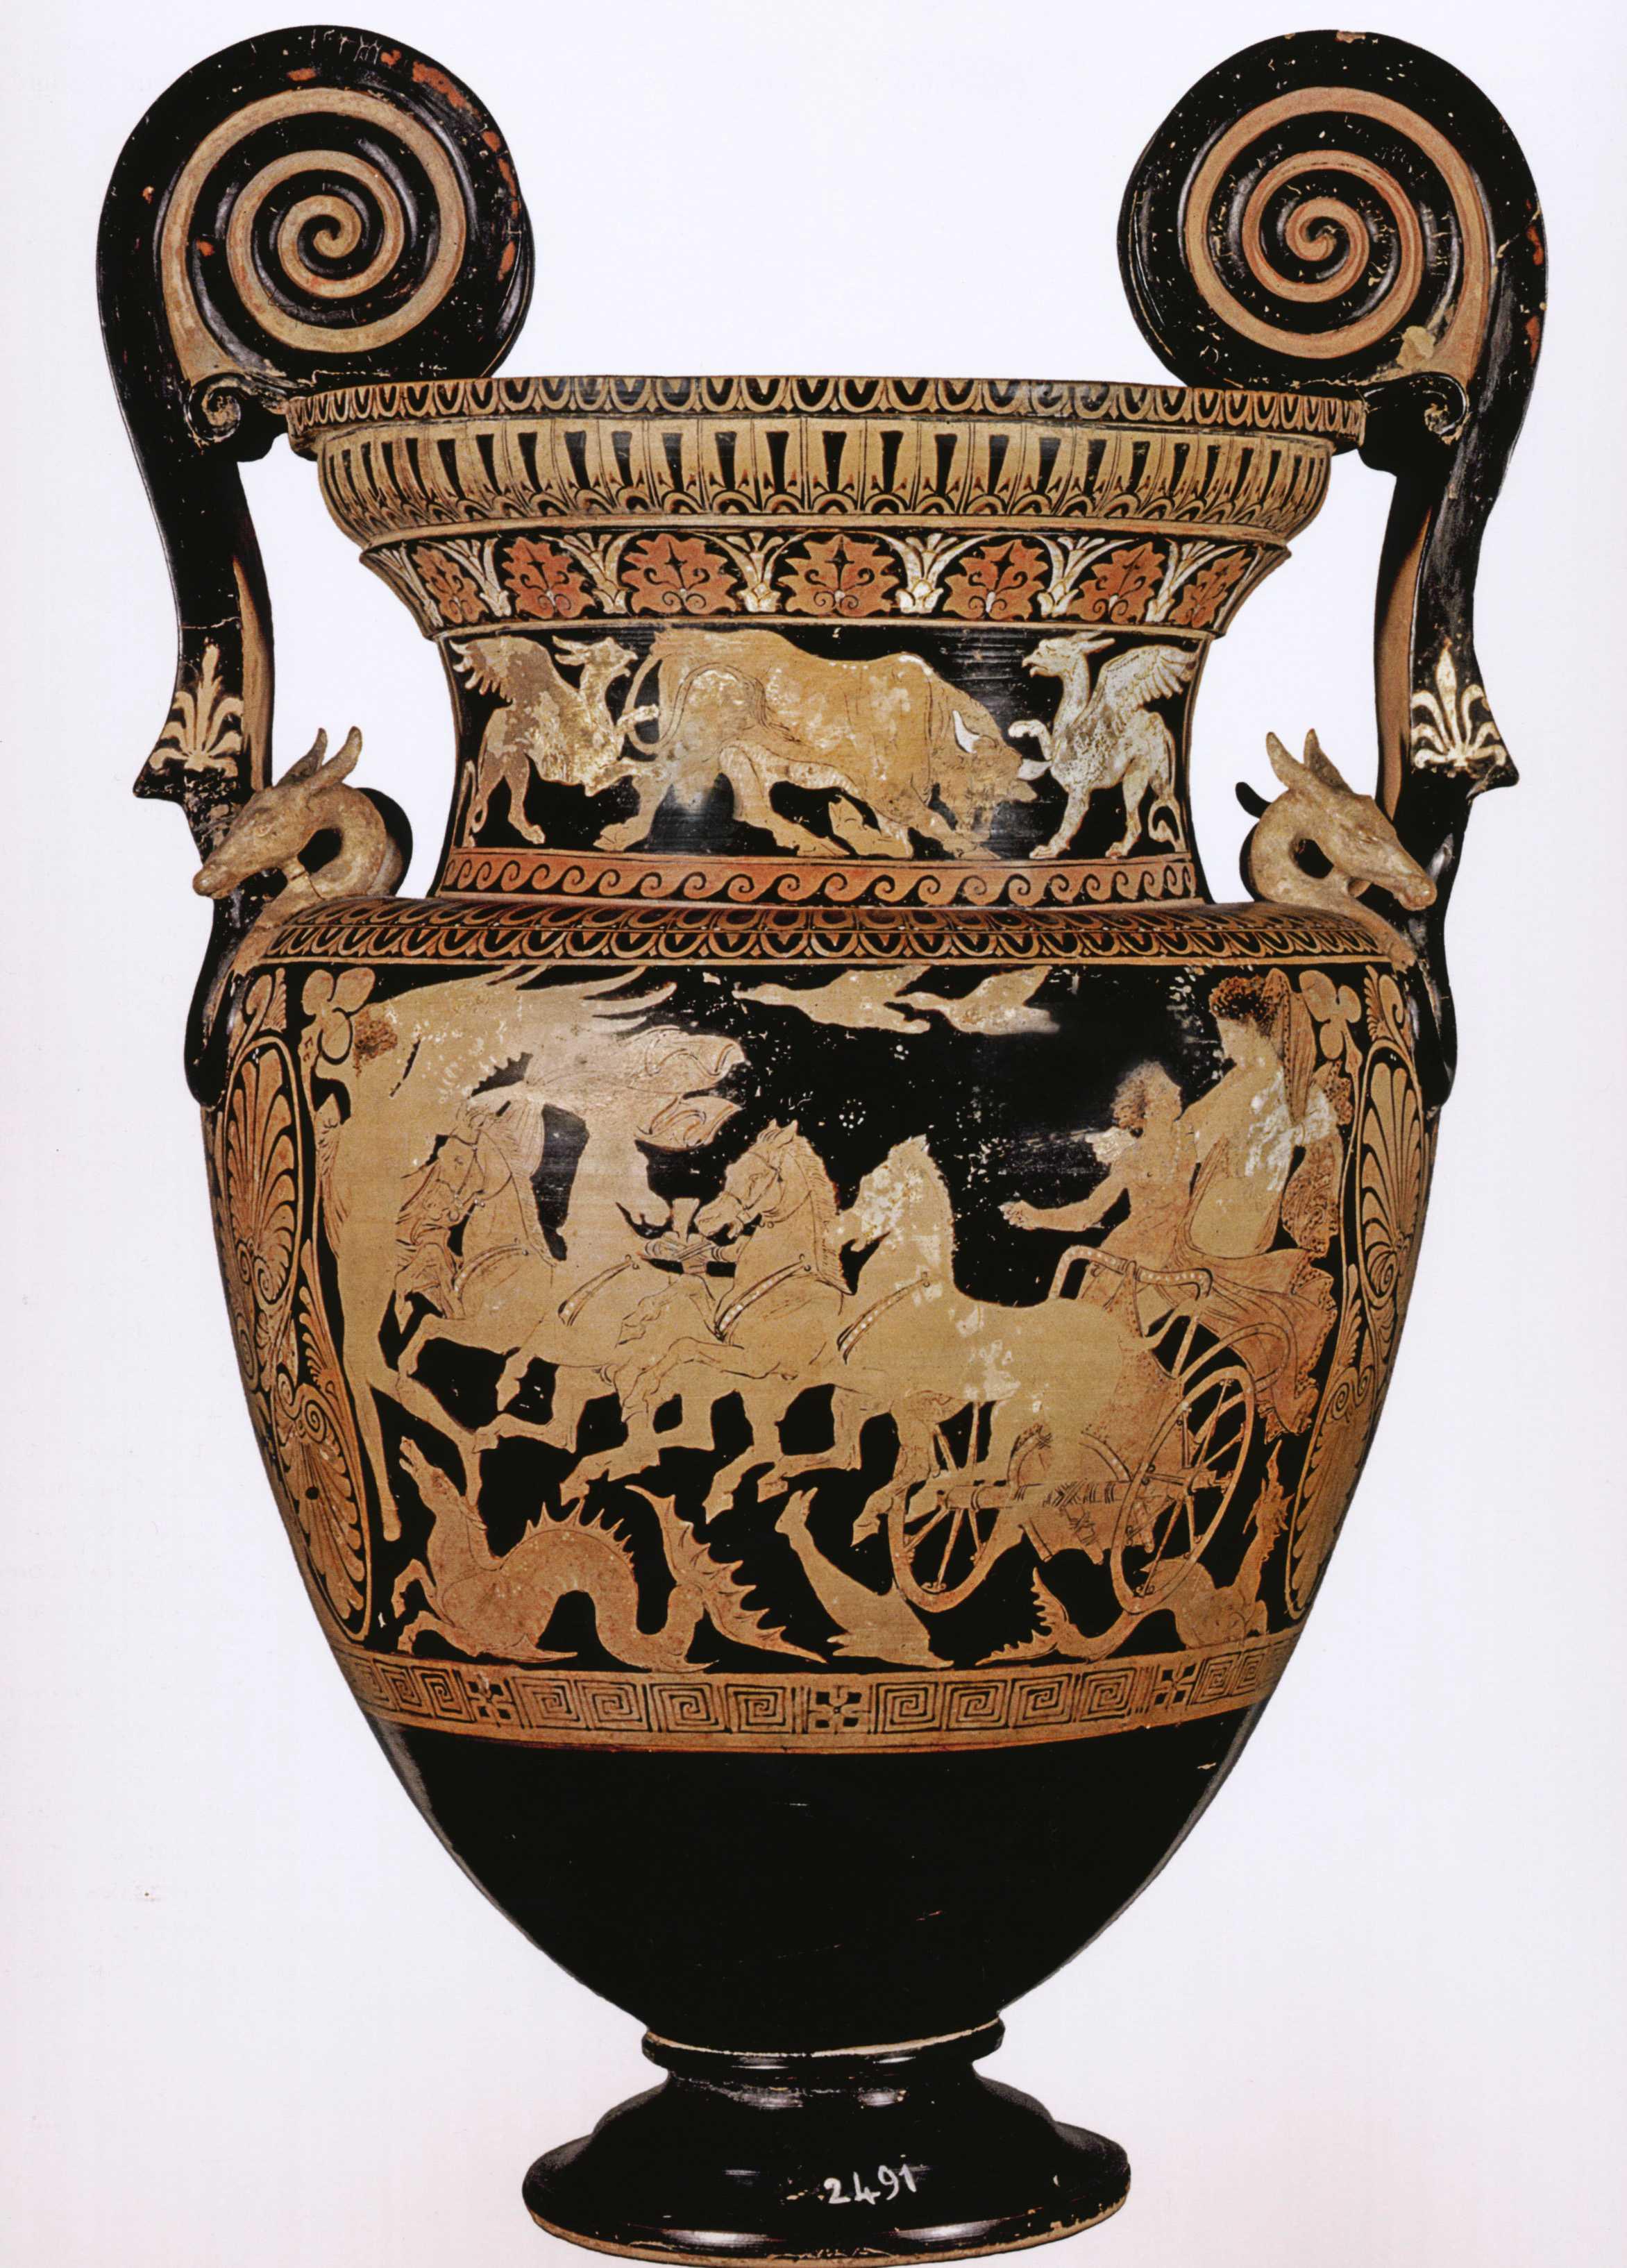 культура этрусков картинки астильба конца